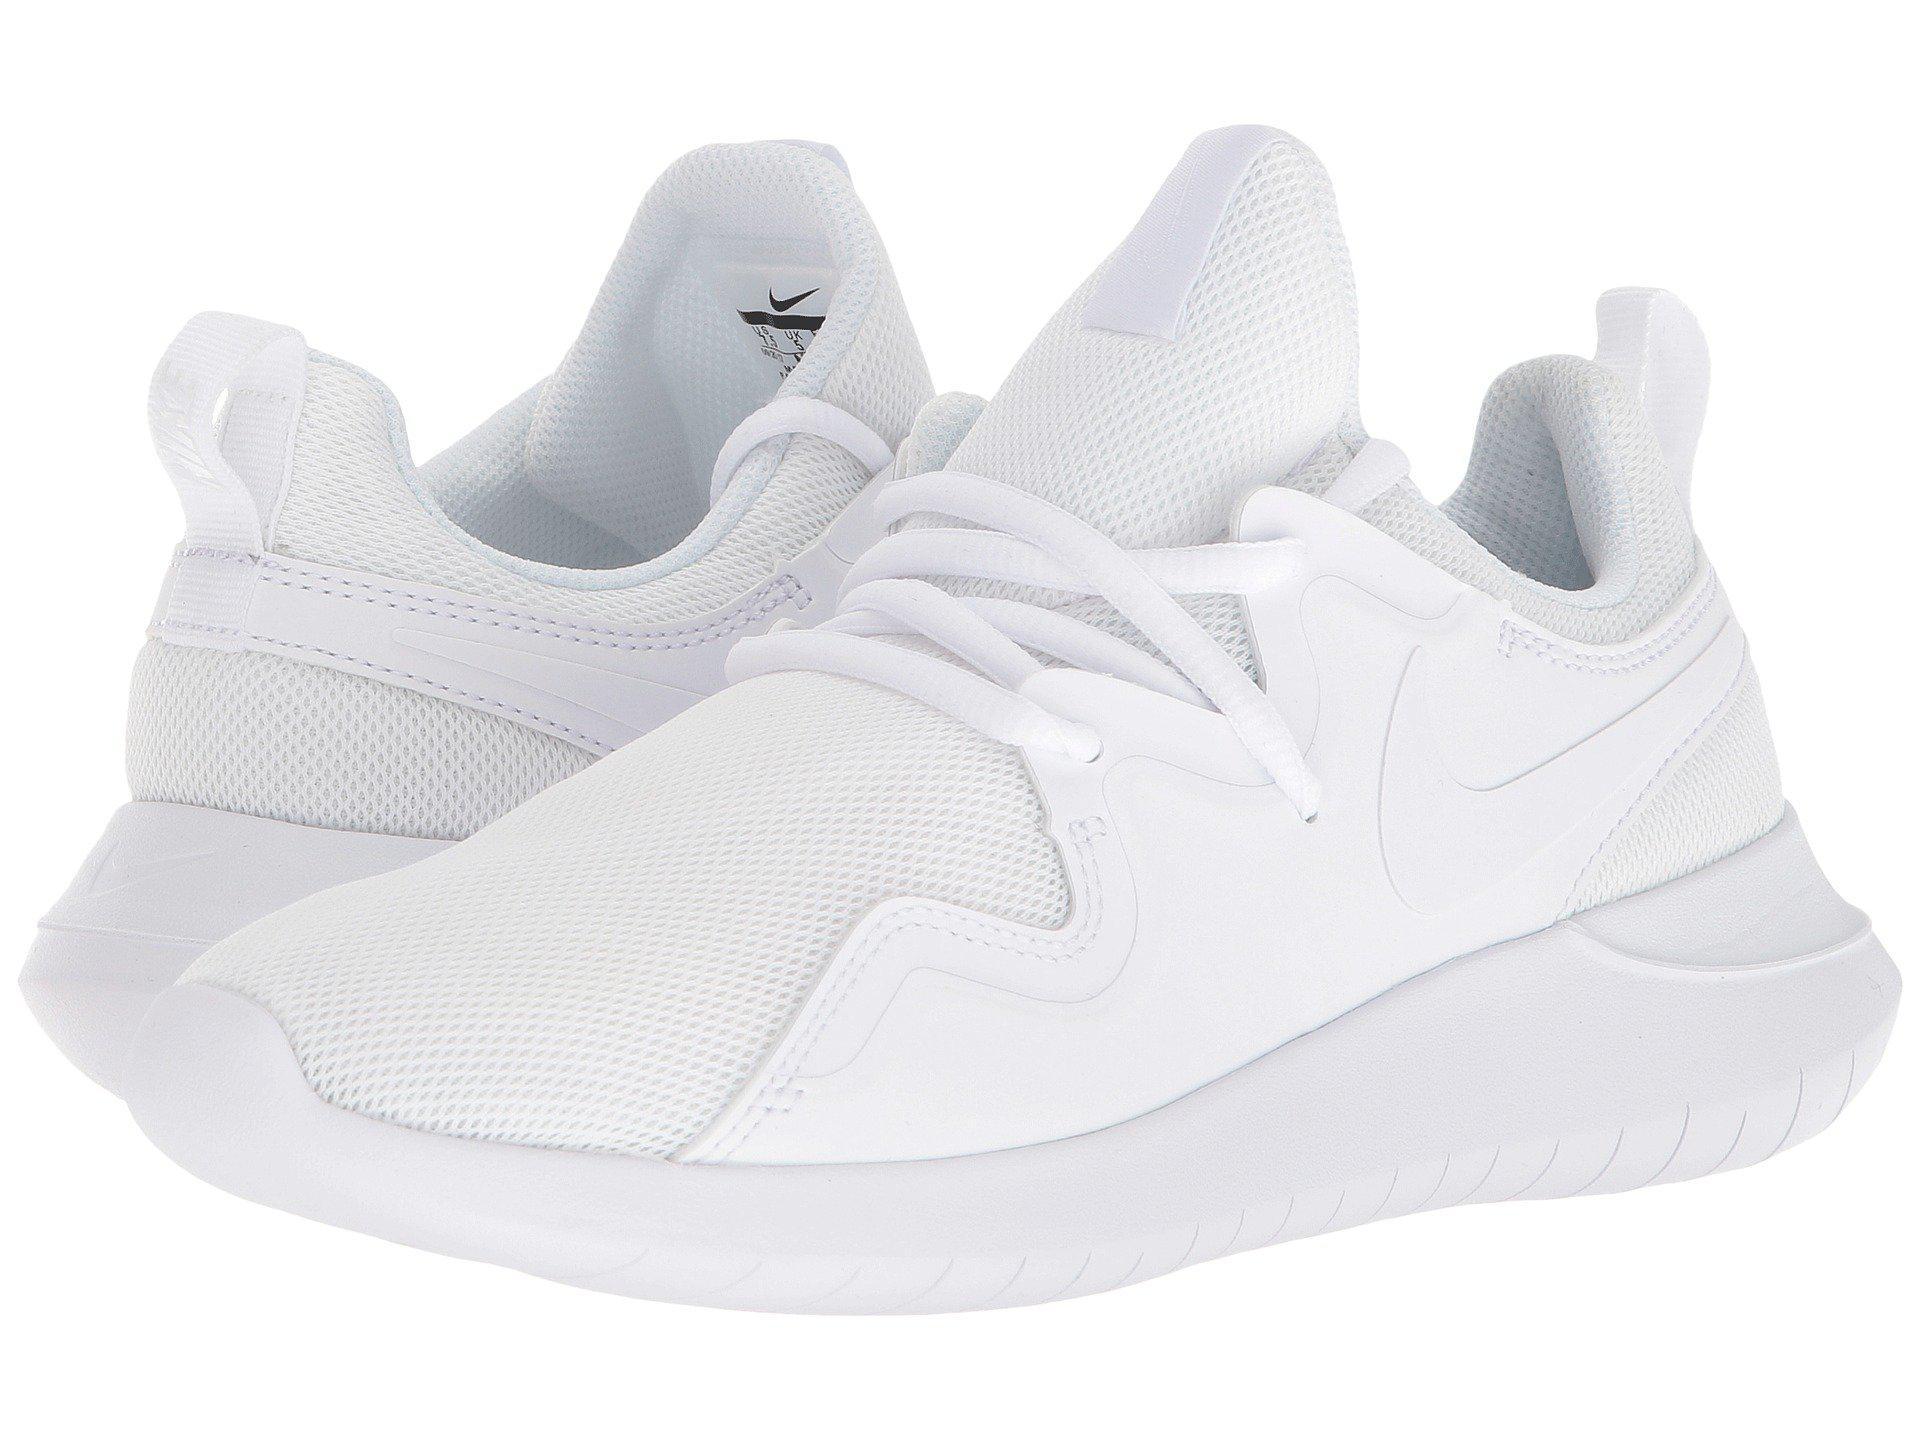 391a651df9e2b Lyst - Nike Tessen in White - Save 50%